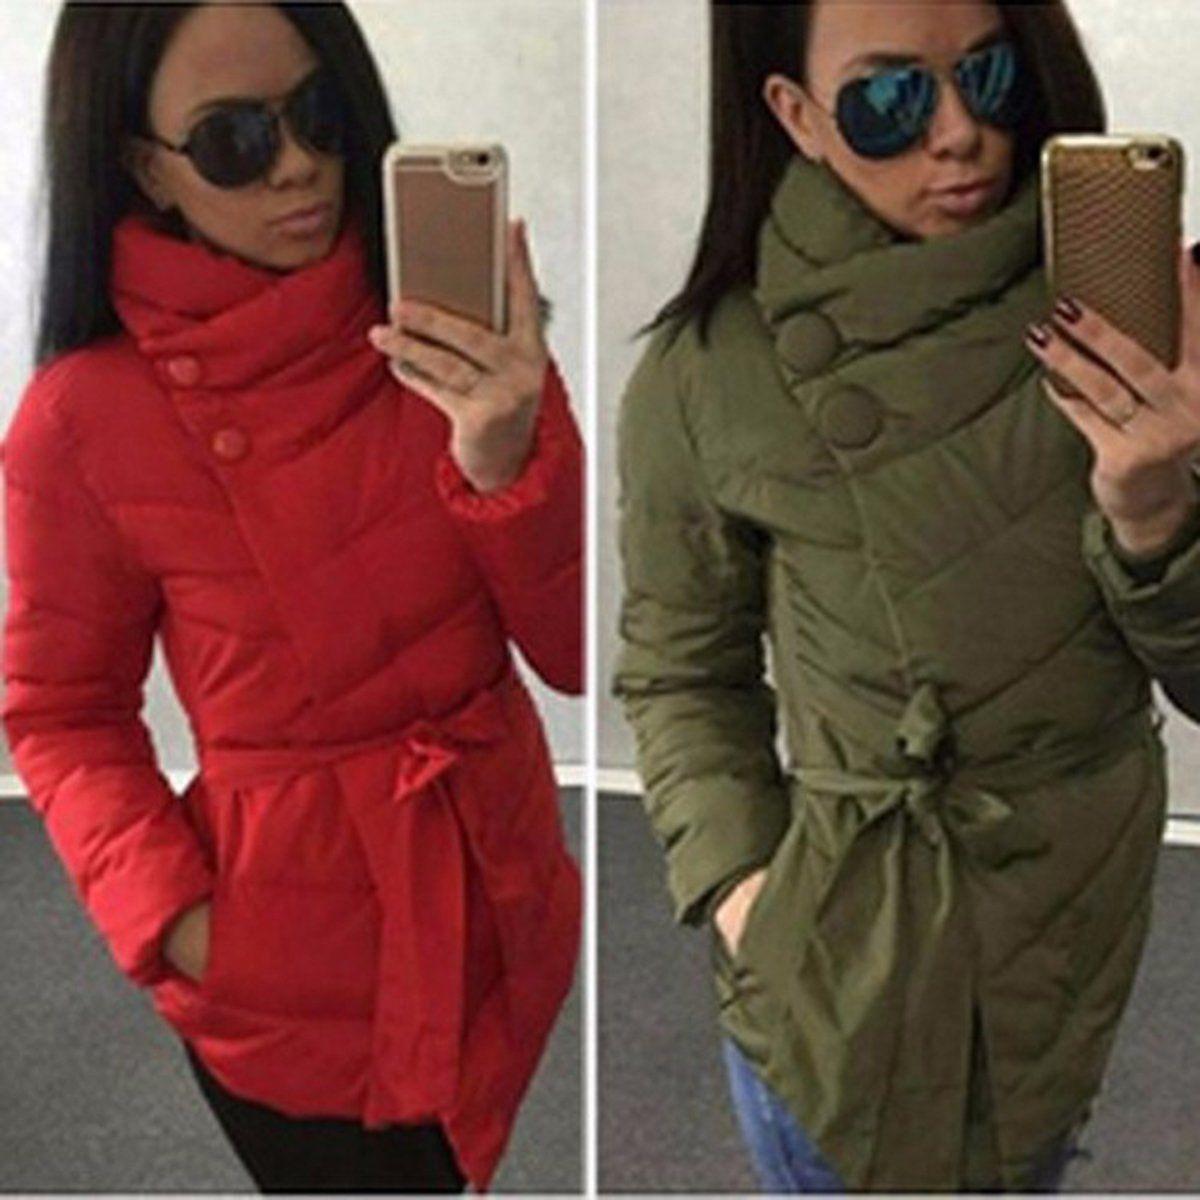 aaa63c1e70bce  14.89 - Women Winter Warm Outerwear Down Cotton Parka Jacket Coat Hooded  Collar  ebay